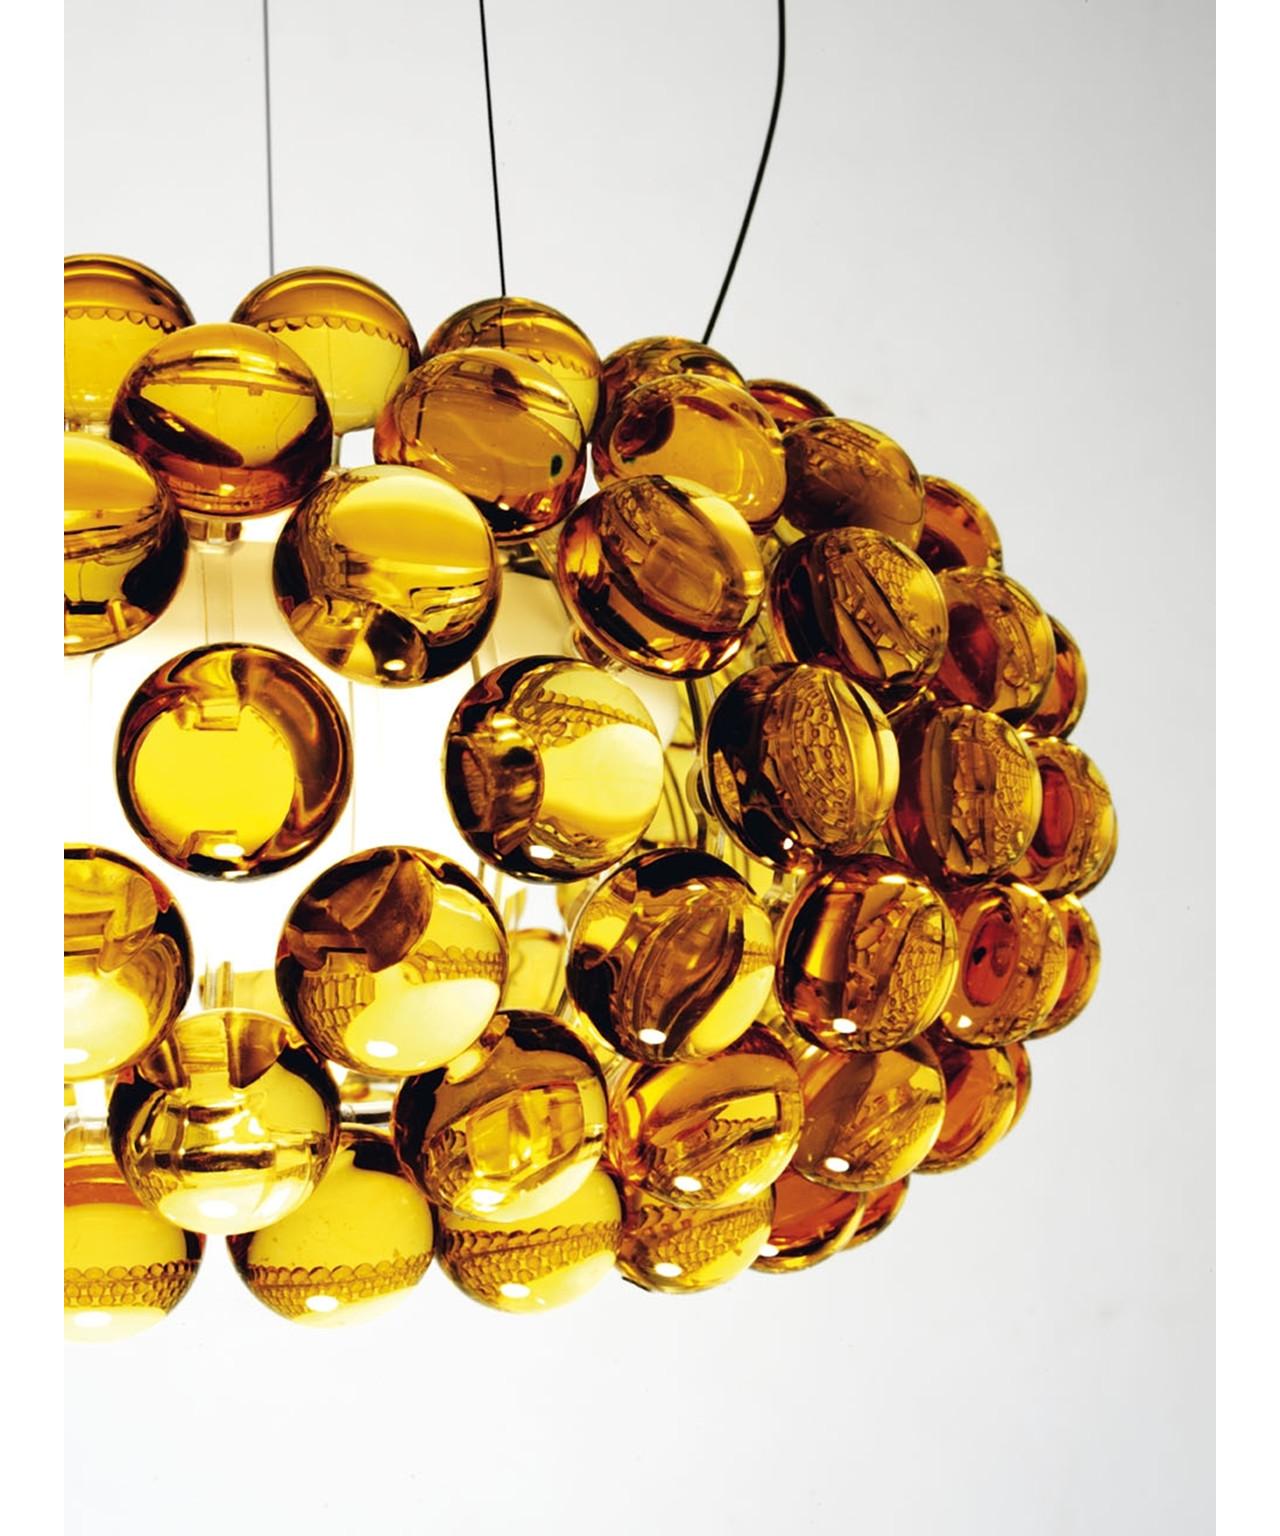 caboche klein pendelleuchte gelb gold foscarini. Black Bedroom Furniture Sets. Home Design Ideas